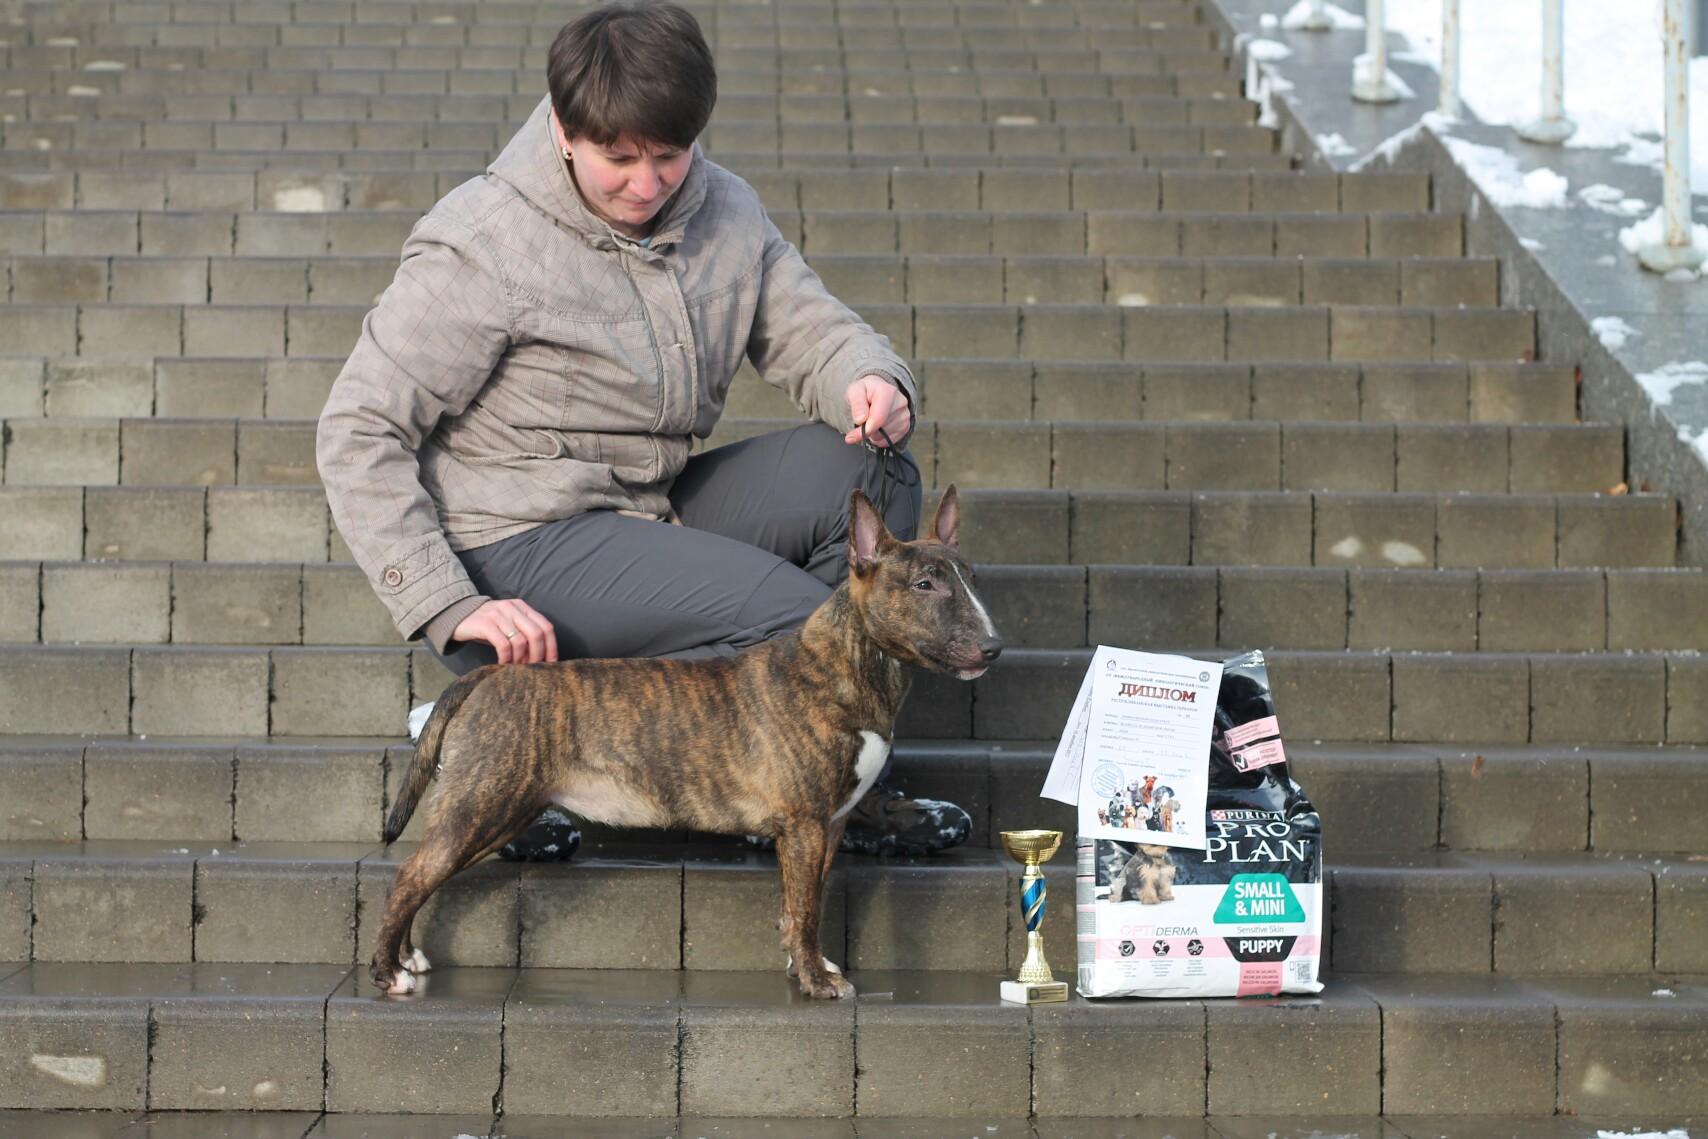 Miniature bull terrier, mini bull, bull show, dogs show, bullterrier kennel, миниатюрный бультерьер, минибуль, щенки минибулей, питомник миниатюрных бультерьеров